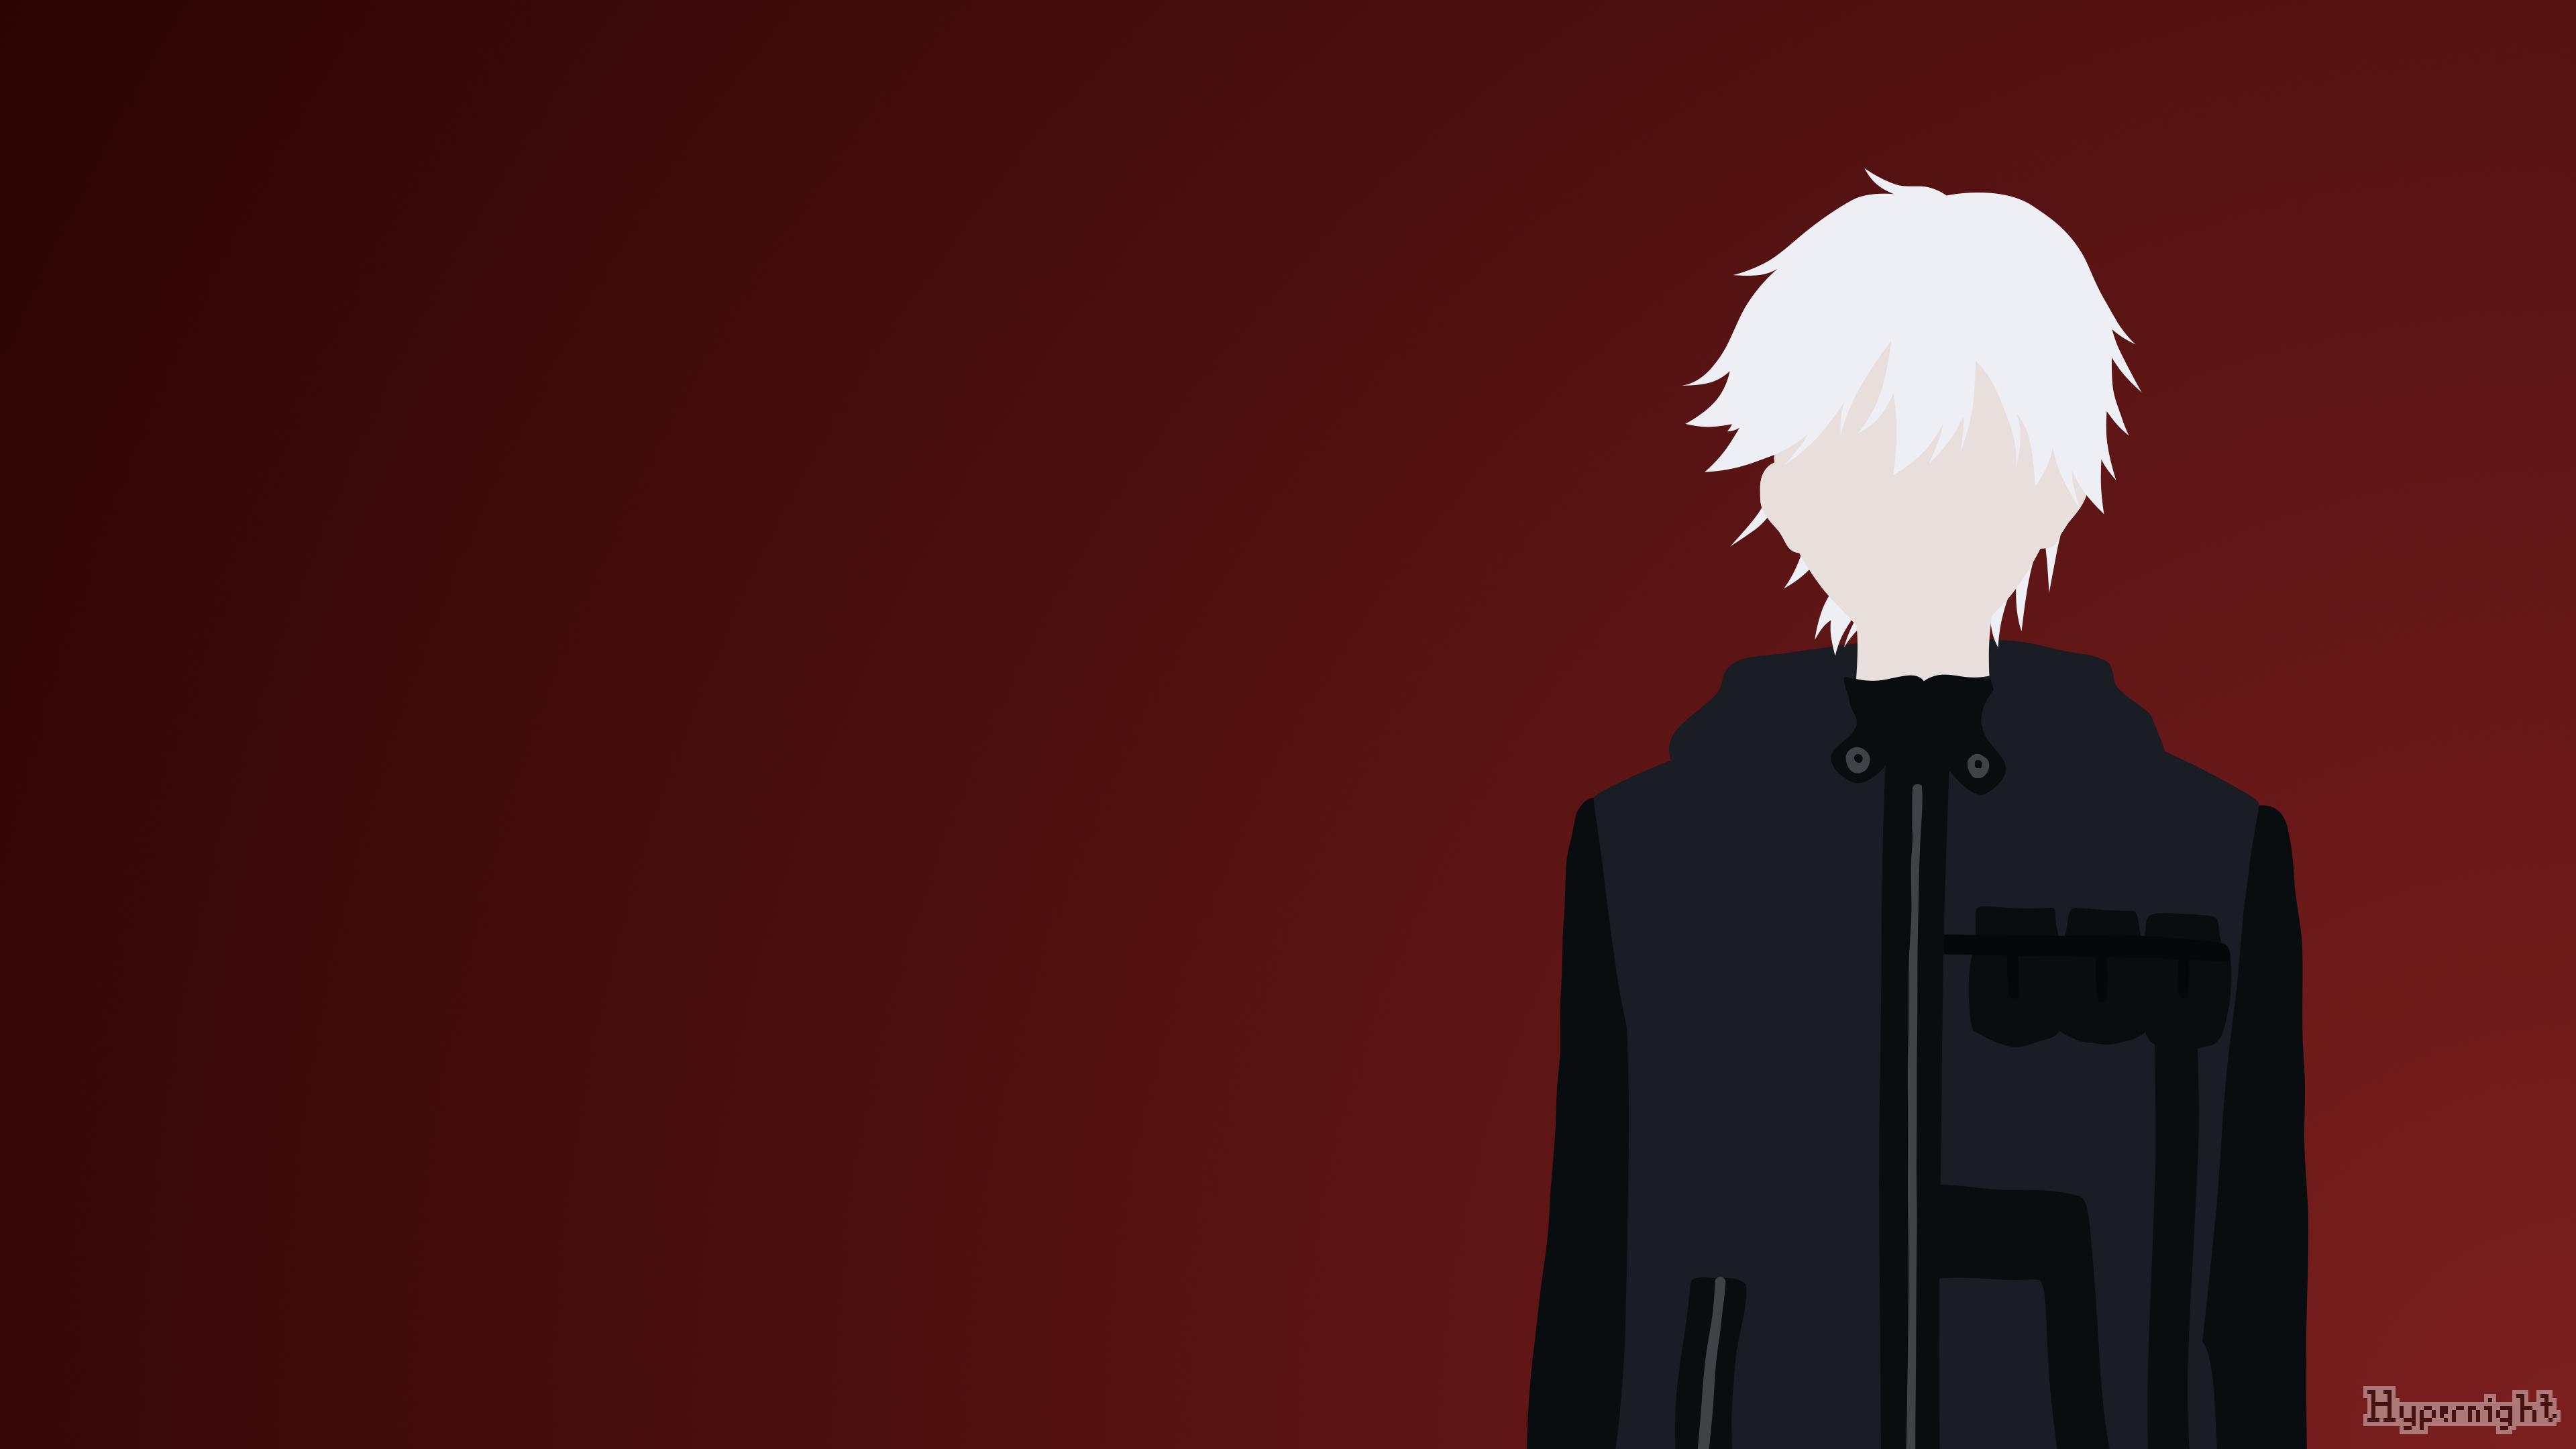 3840x2160 Simpel Tokyo Ghoul By Derhypernight Manga Amp Anime Digital Media